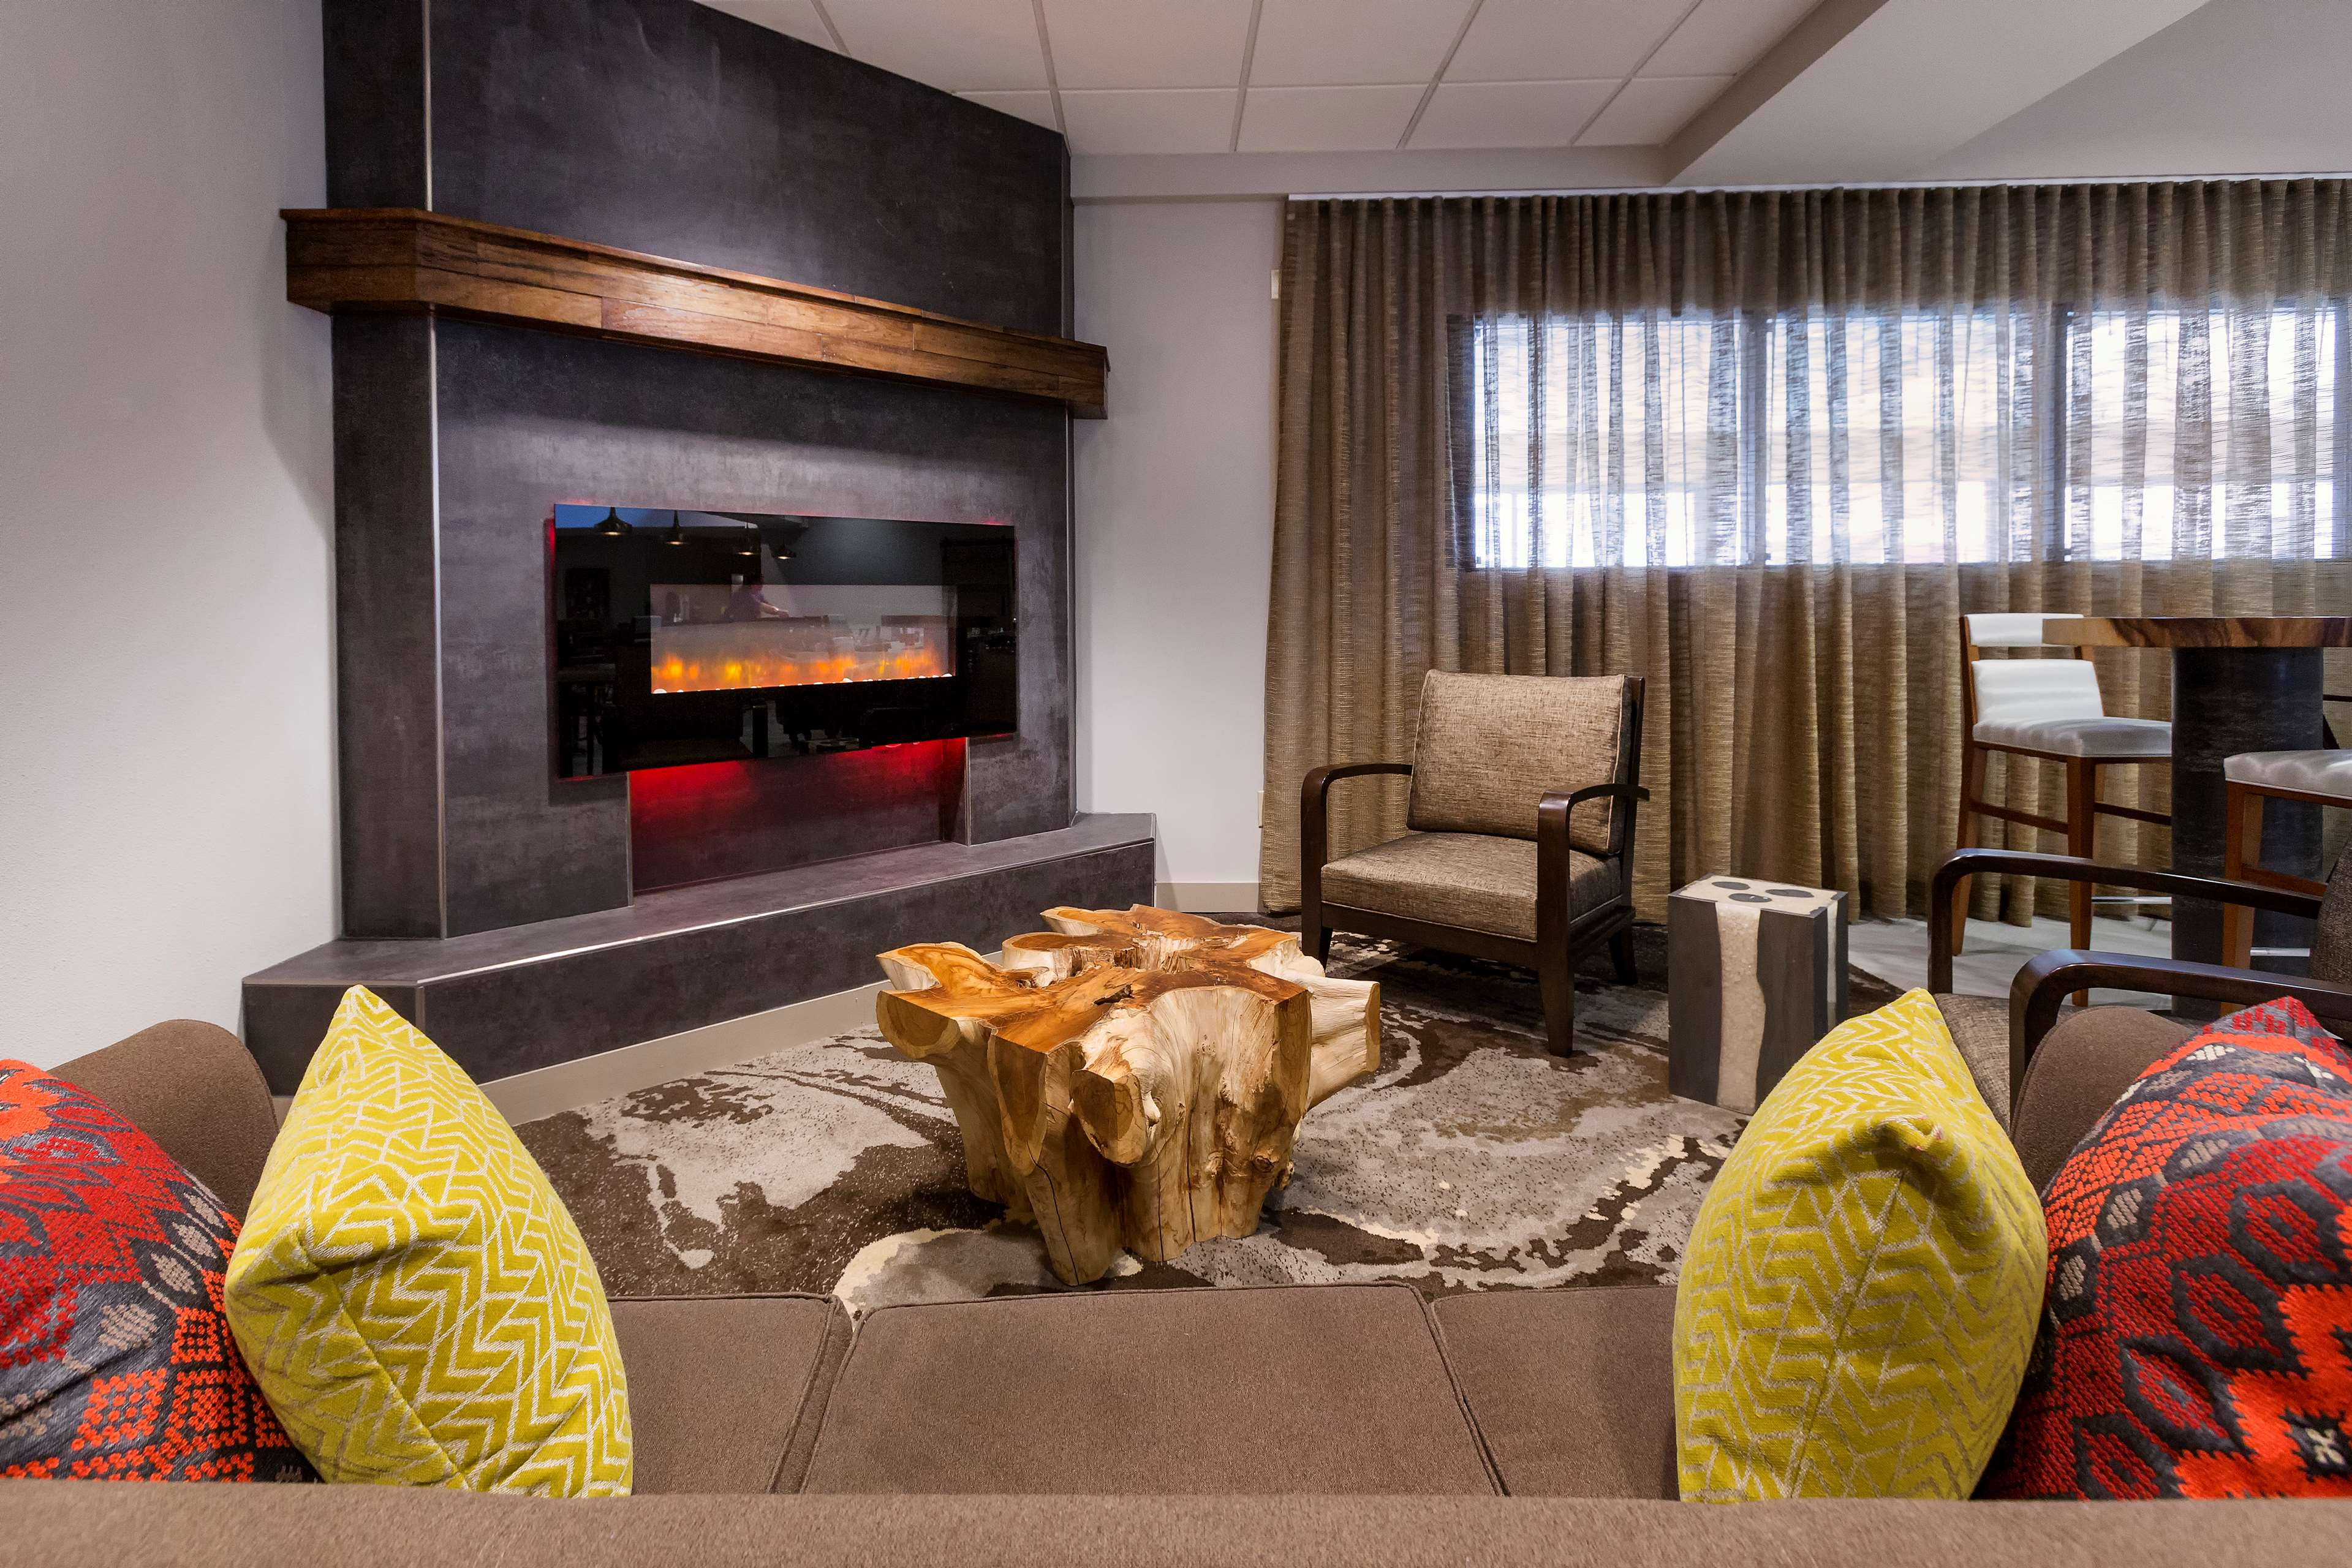 DoubleTree Suites by Hilton Hotel Nashville Airport image 7